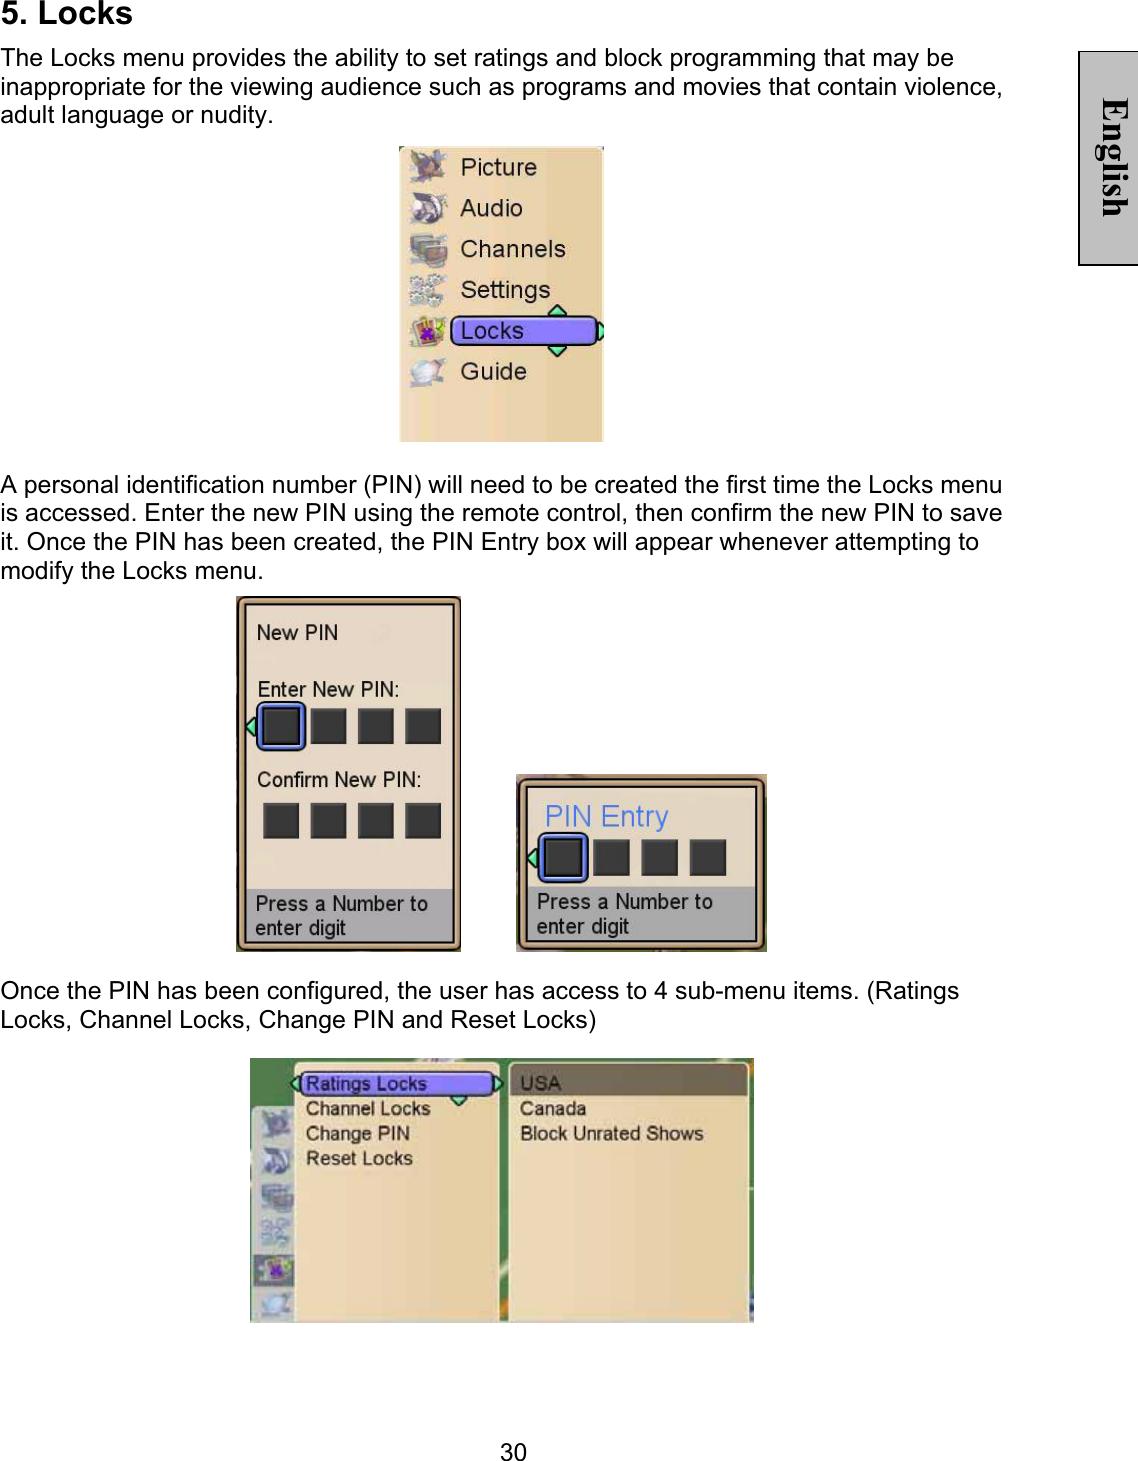 Vivitek Lt32Pl3 A Users Manual 501002990101